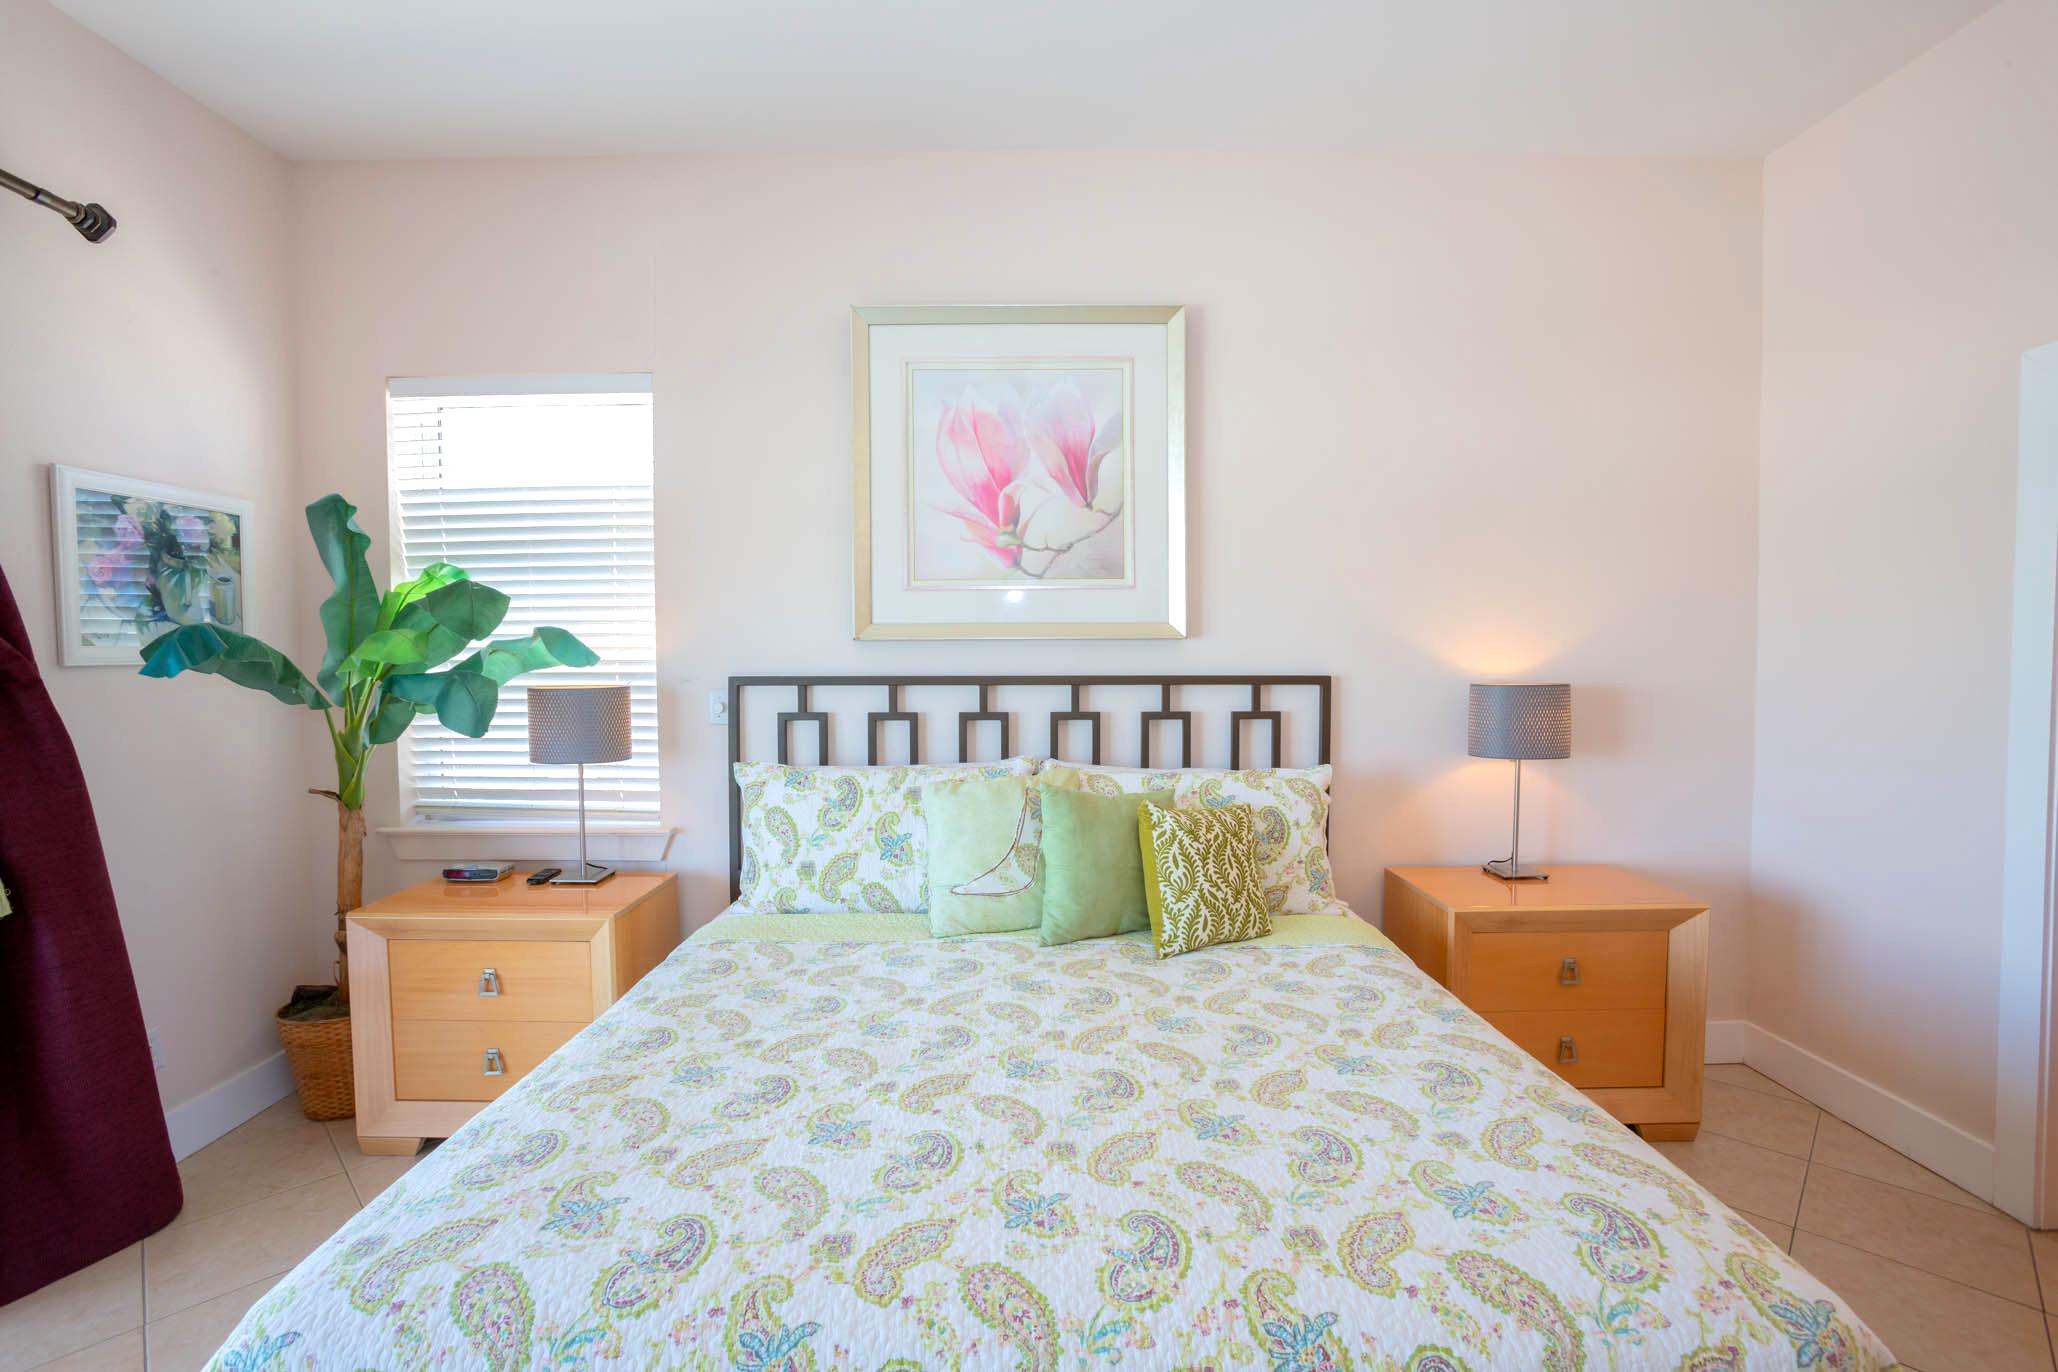 Ariola 1214 House/Cottage rental in Luxury Homes in Pensacola Beach Florida - #27